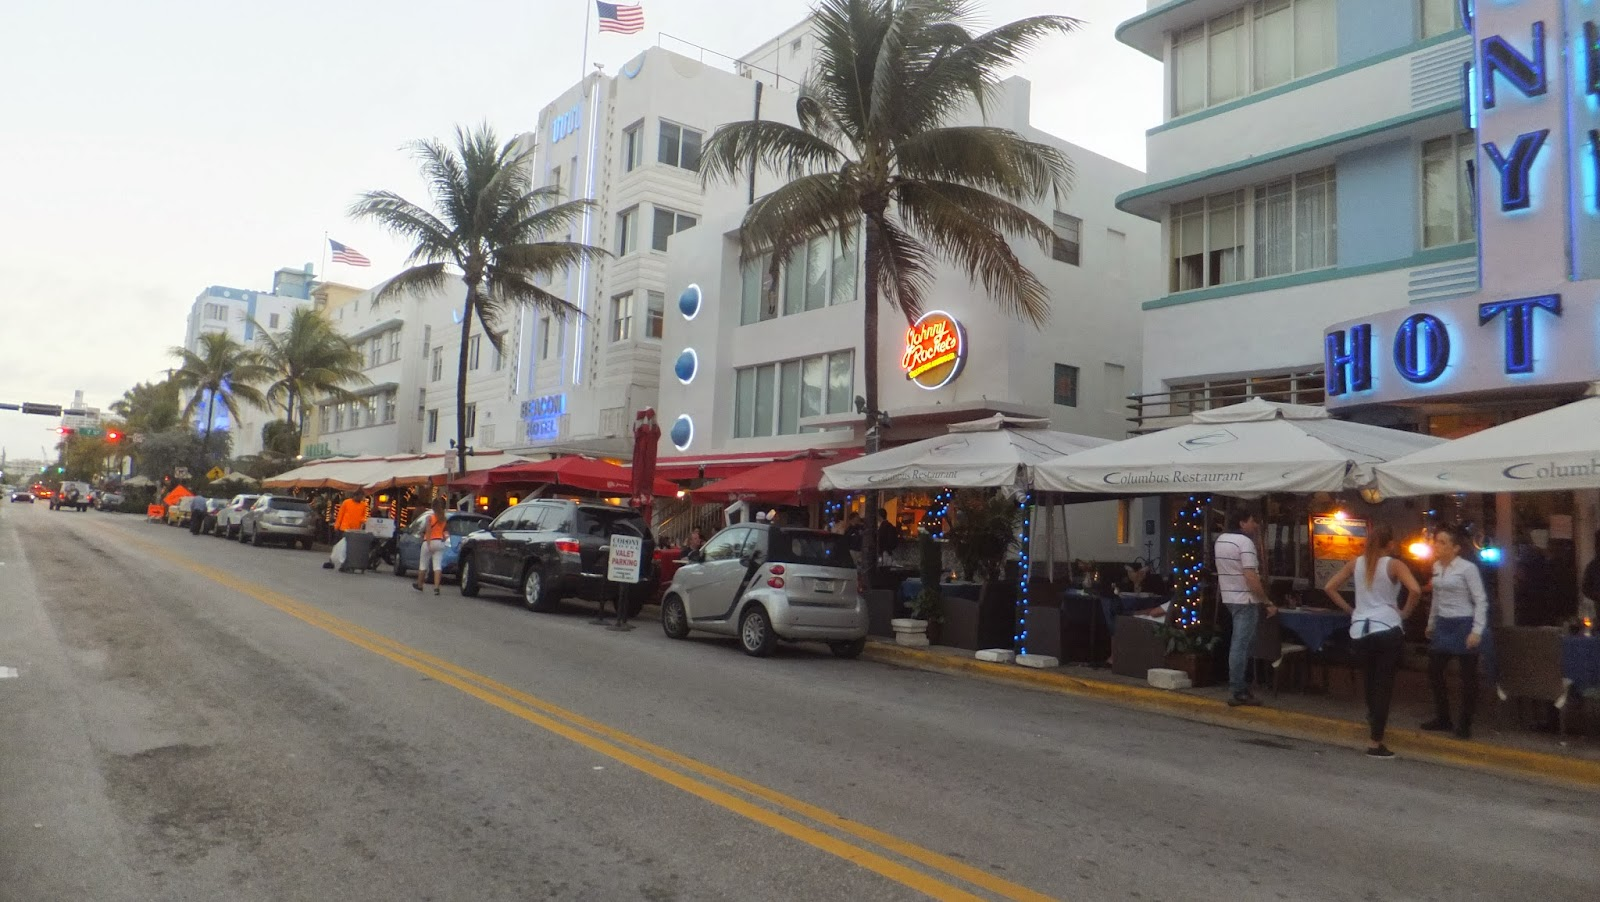 Colony, Ocean Drive, Miami Beach, SoBe, Florida, Elisa N, Blog de Viajes, Lifestyle, Travel